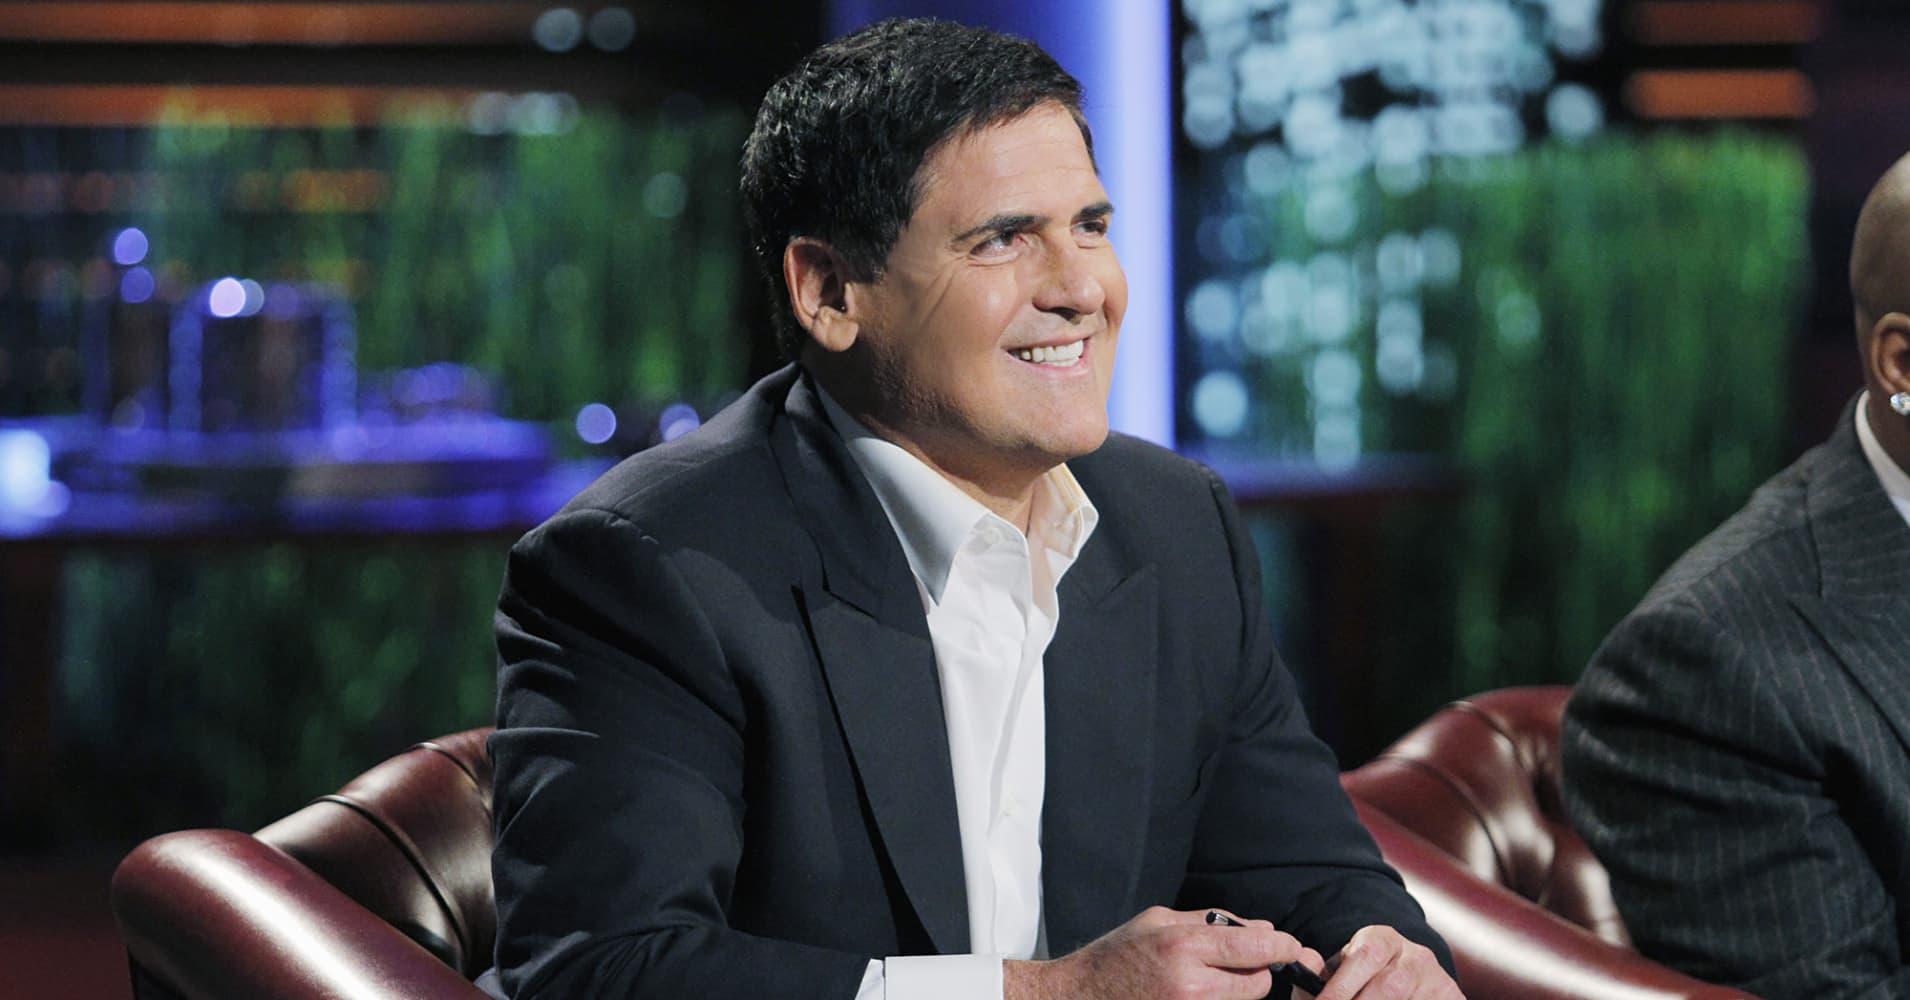 Mark Cuban smiling